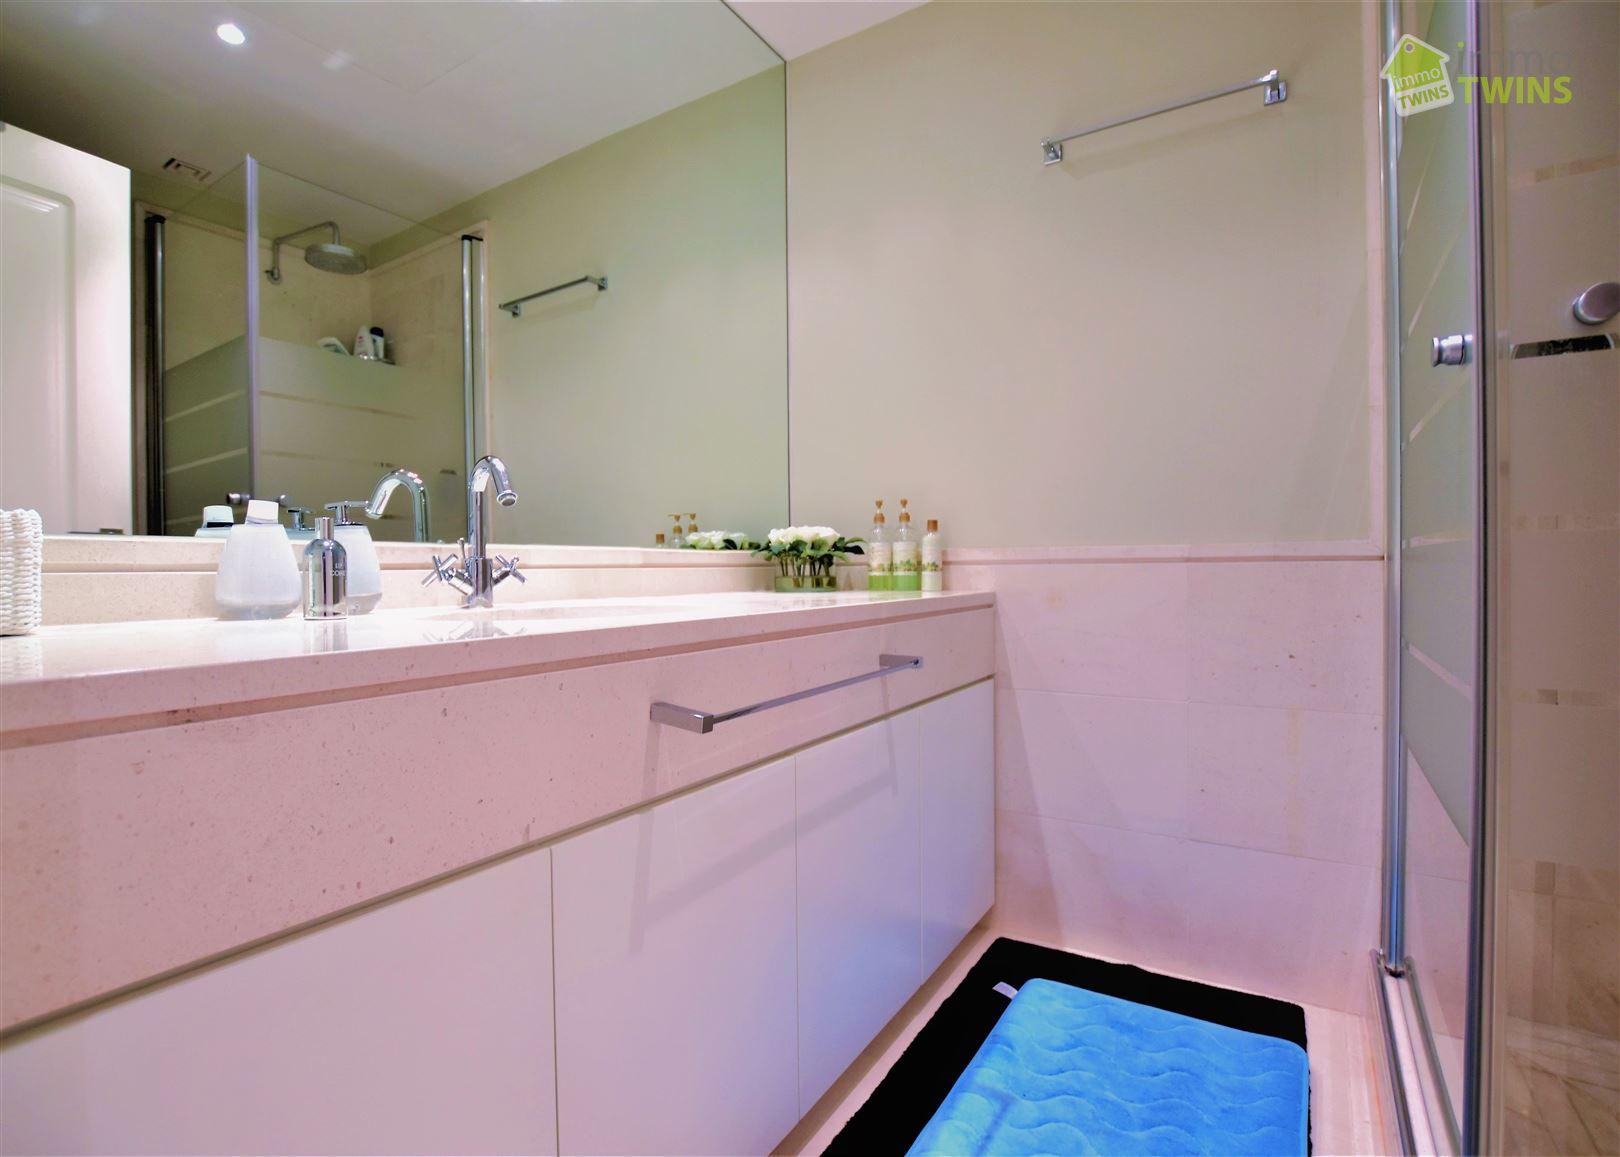 Foto 24 : Appartement te 29679 MARBELLA (Spanje) - Prijs € 485.000